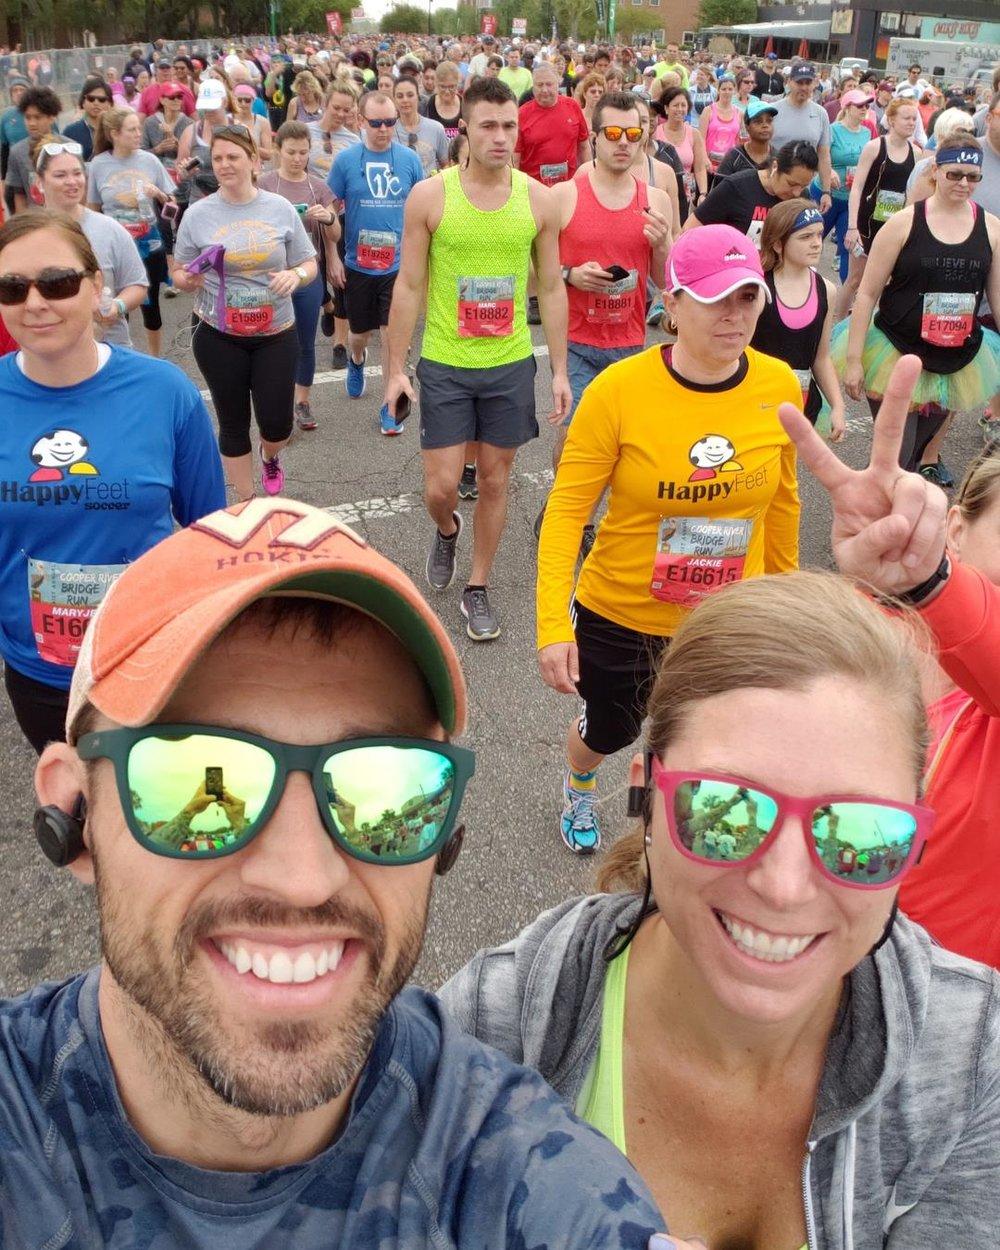 Our favorite run together - Cooper River Bridge Run in Charleston, SC